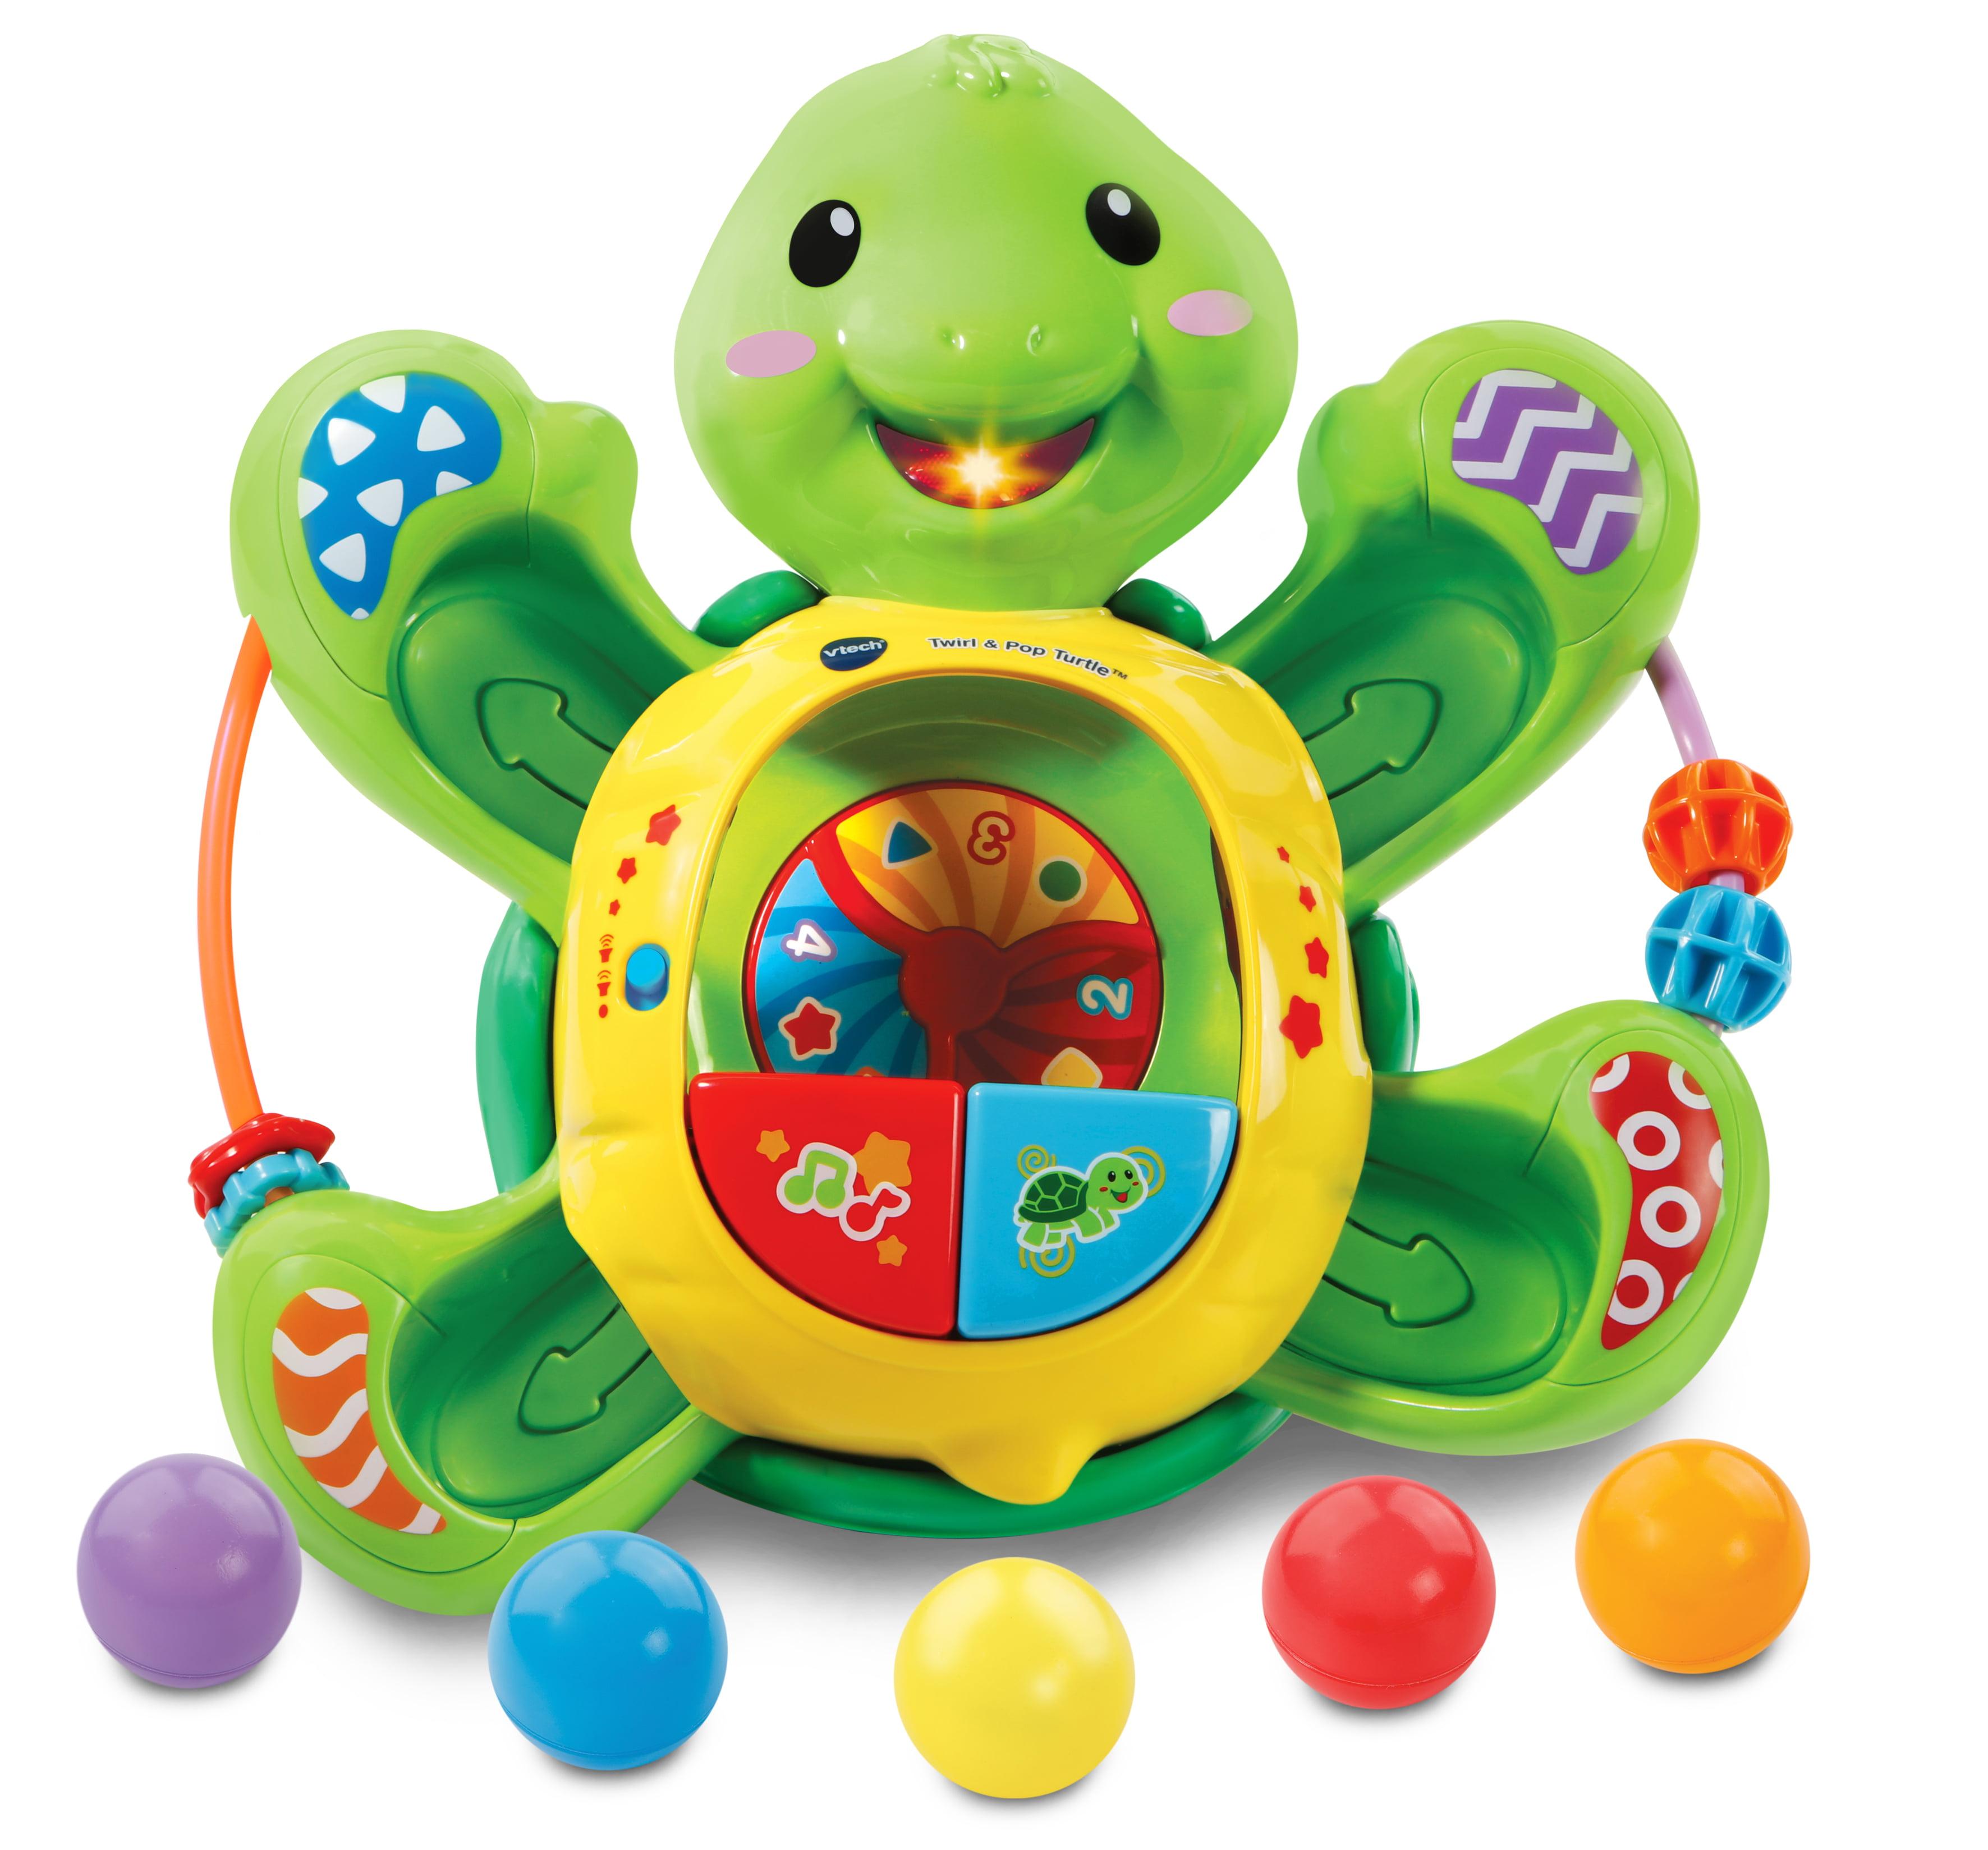 VTech Pop-a-Balls - Twirl & Pop Turtle